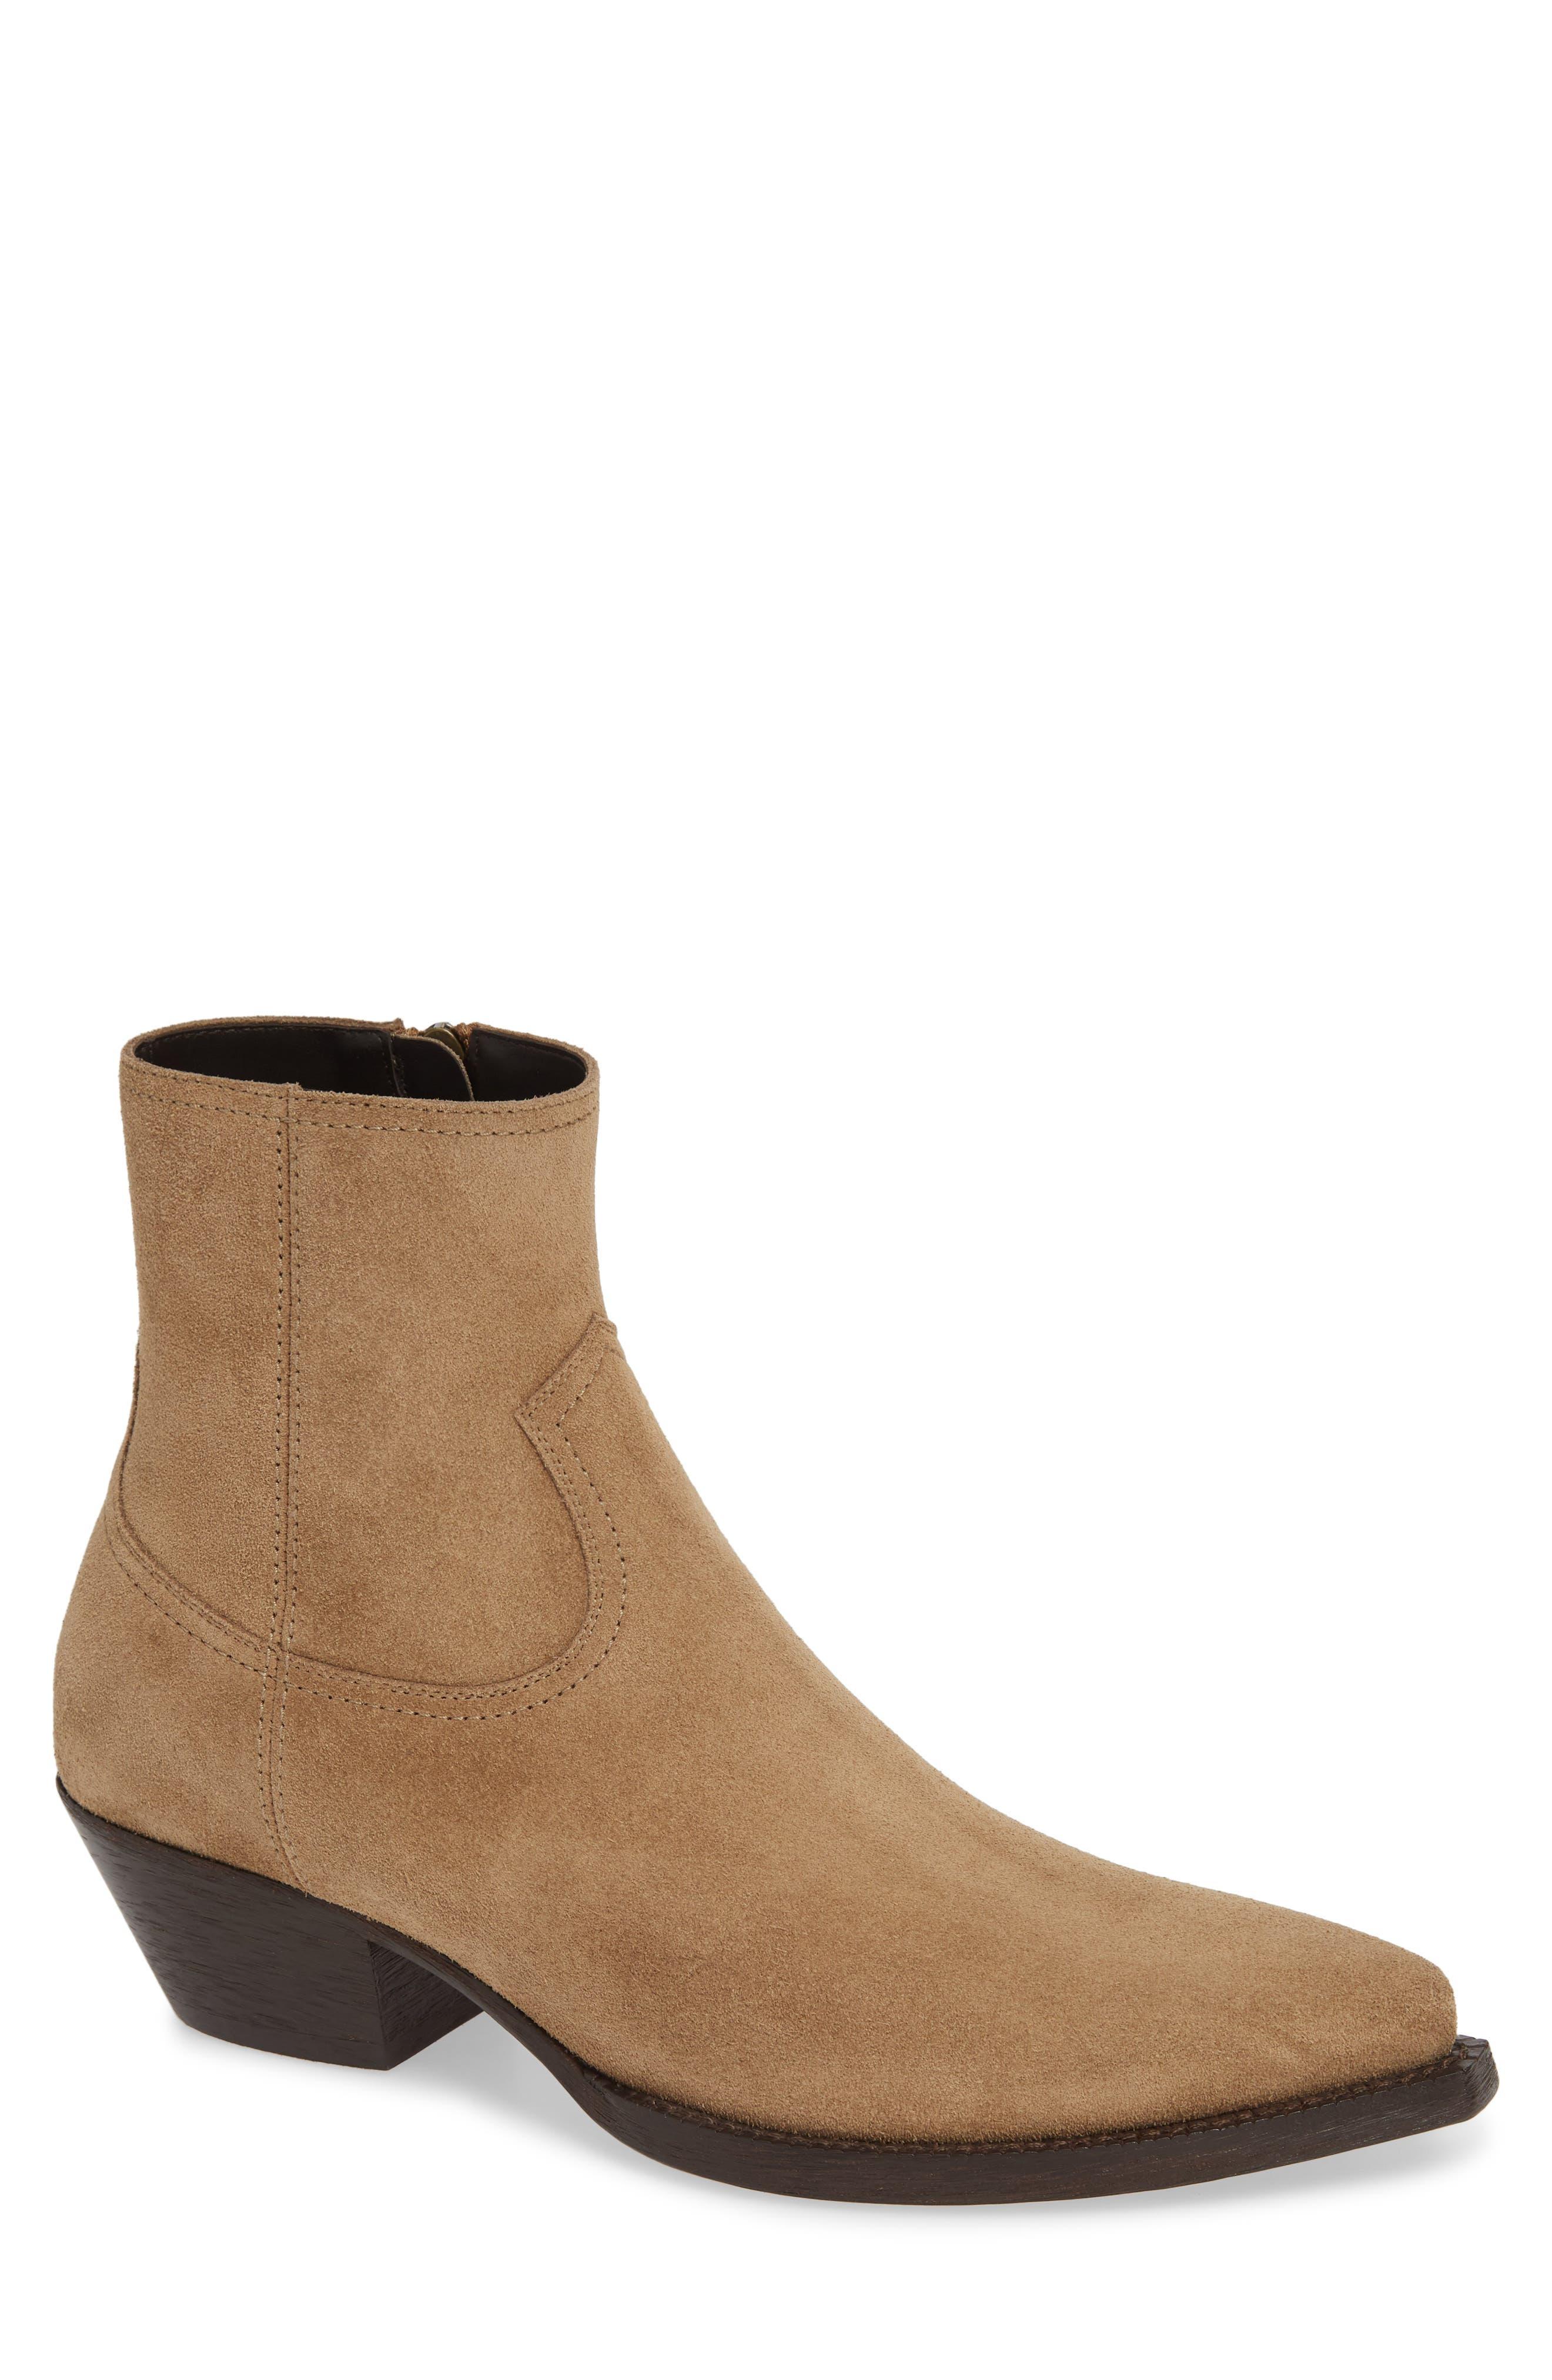 22d65f55b40 yves saint laurent boots   Nordstrom